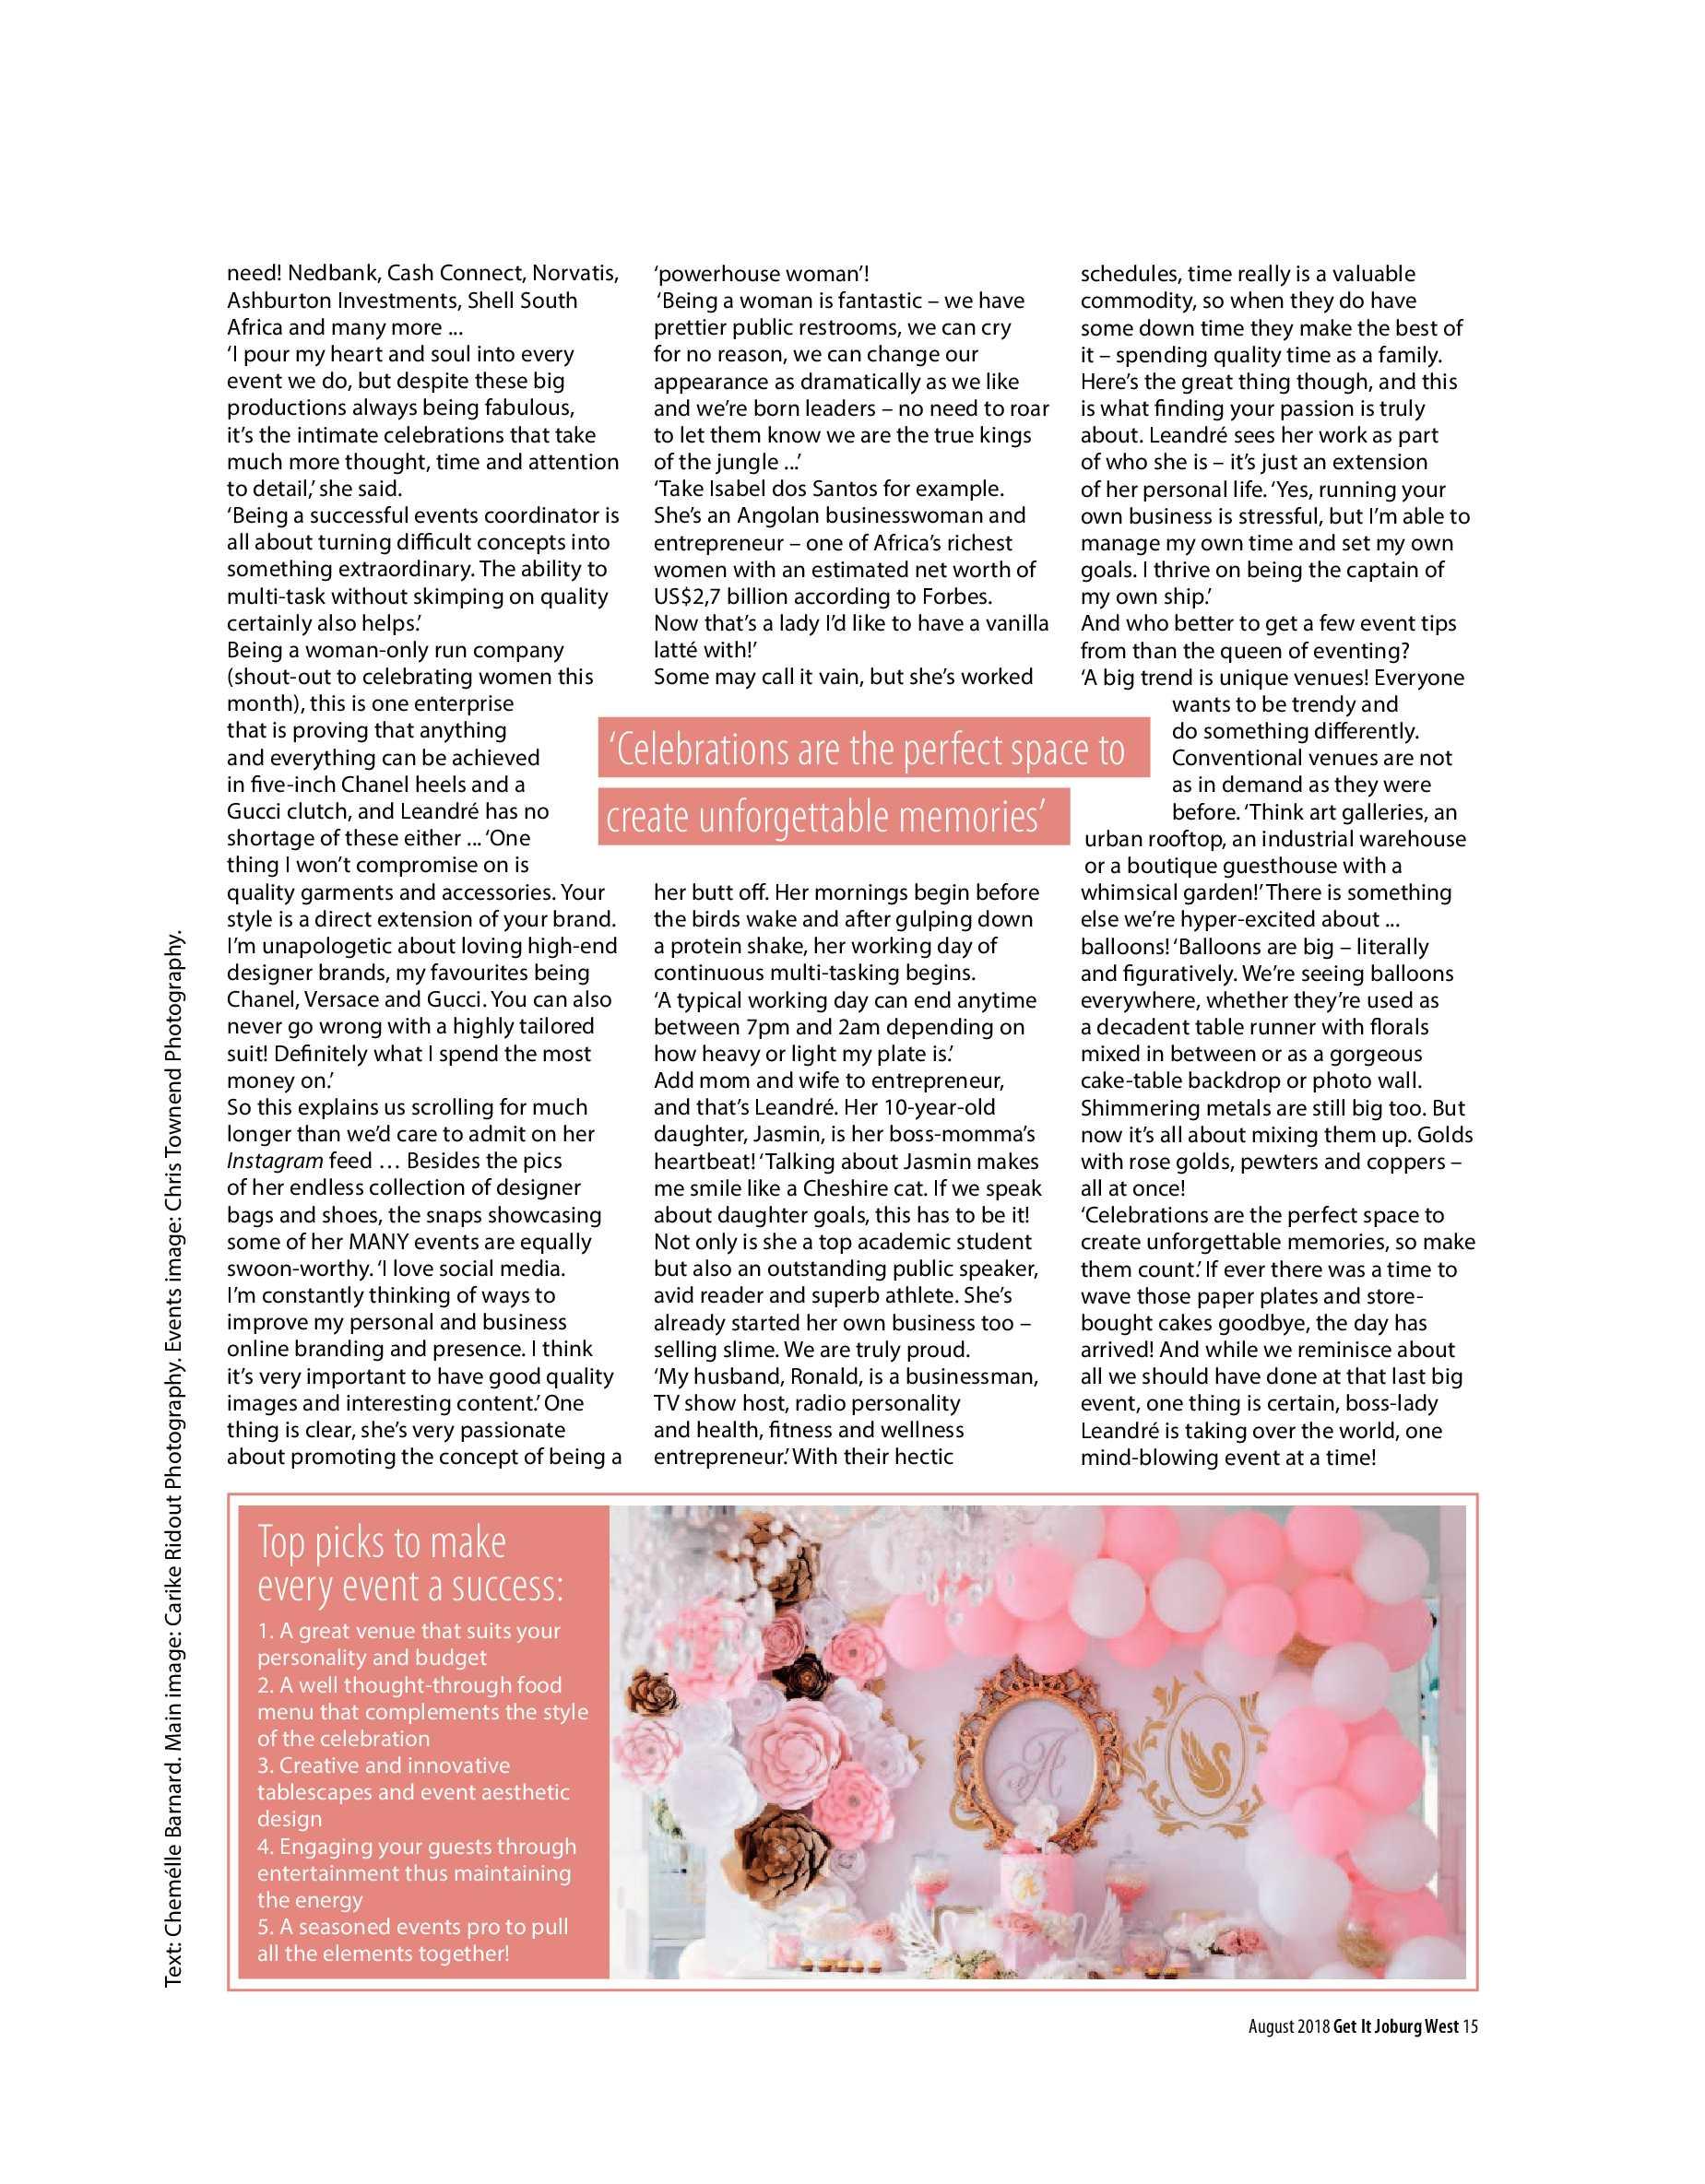 getit-joburg-west-august-2018-epapers-page-15